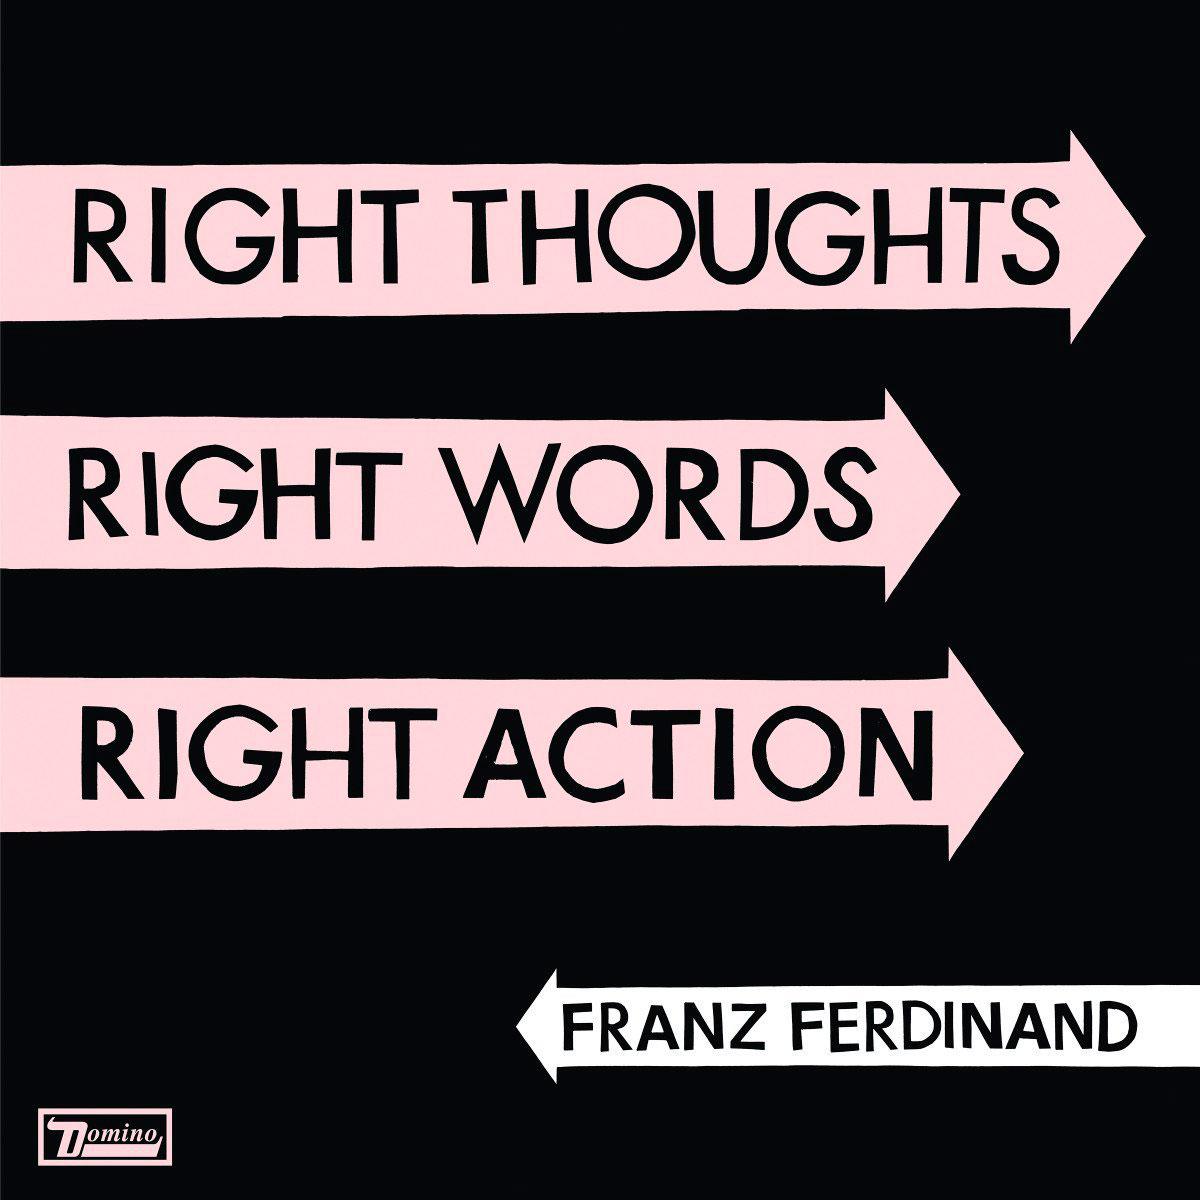 ferdinand black singles Find great deals on ebay for franz ferdinand lp and arctic monkeys lp shop with confidence.